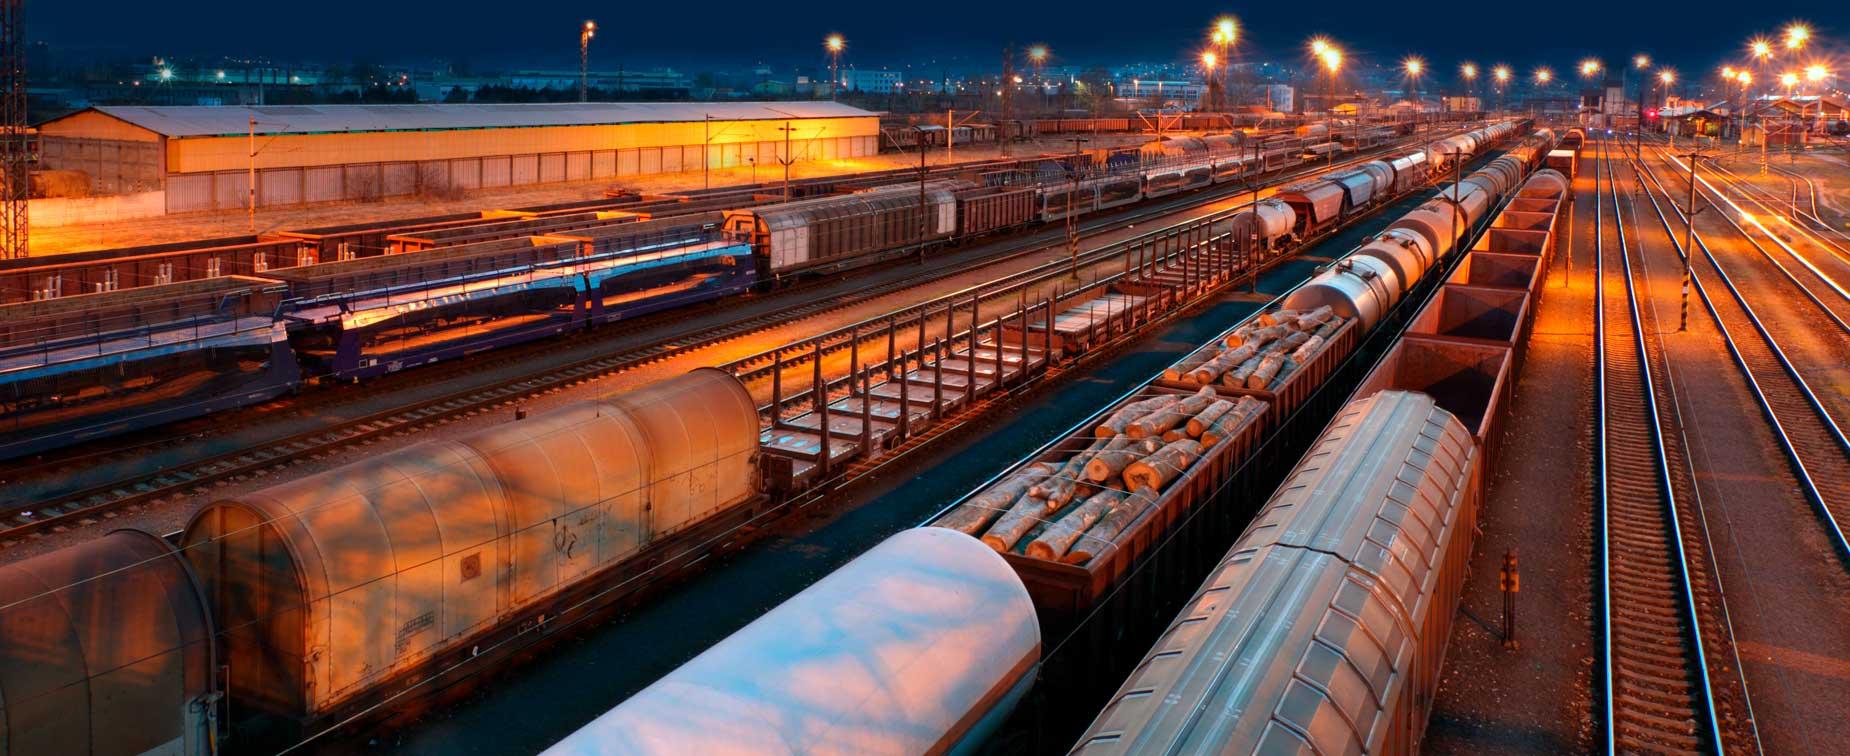 Photo of rail yard